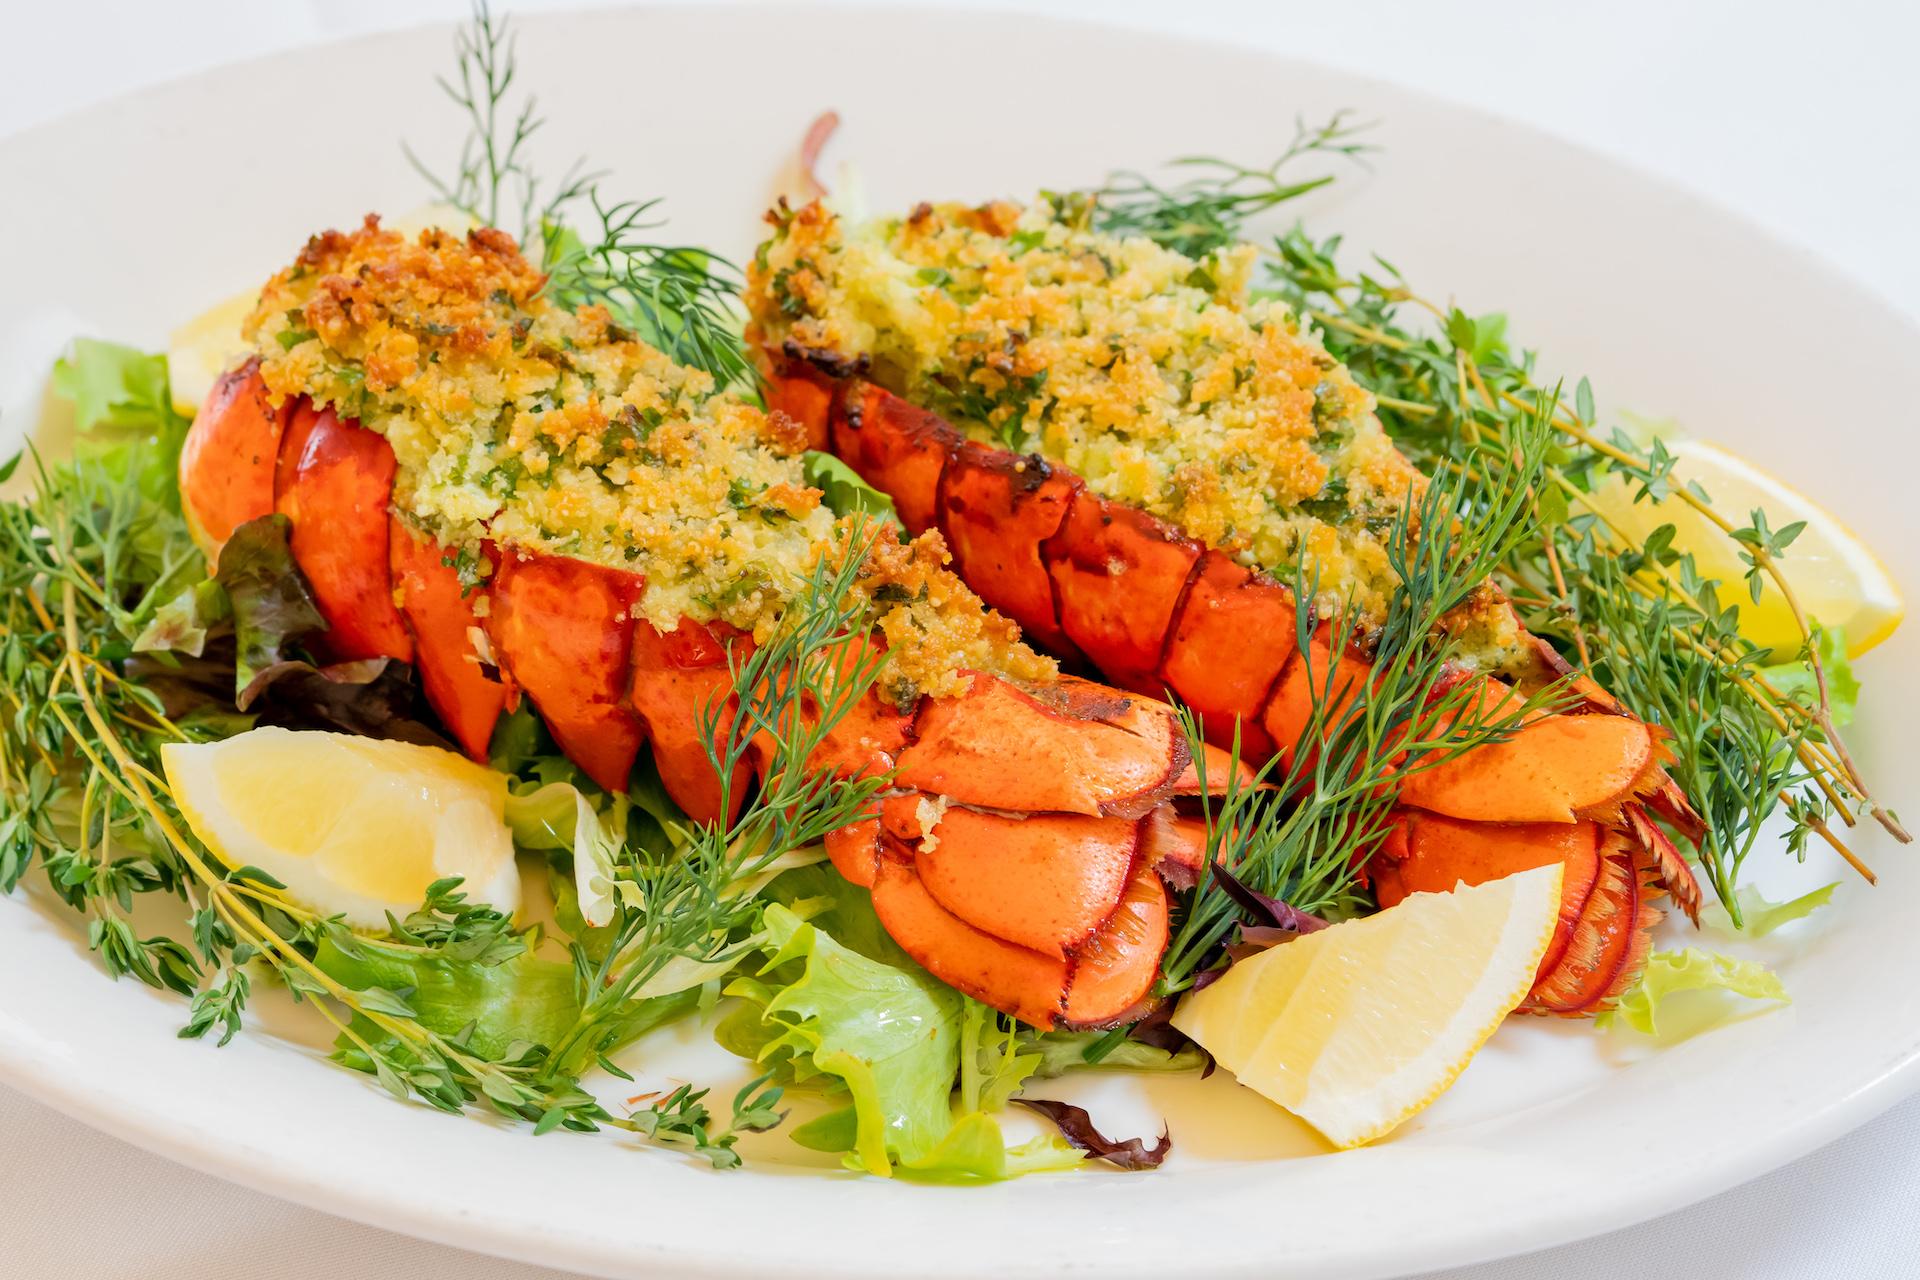 Herb Crusted Lobster ハーブクラステッドロブスター($48)   身のしまった新鮮なメインロブスターテイル2尾にリコッタチーズペストをのせてオープンで焼き上げた風味豊かなイタリアンシーフードディッシュです。ロブスターテイルの追加も可能(1尾につき$24)。